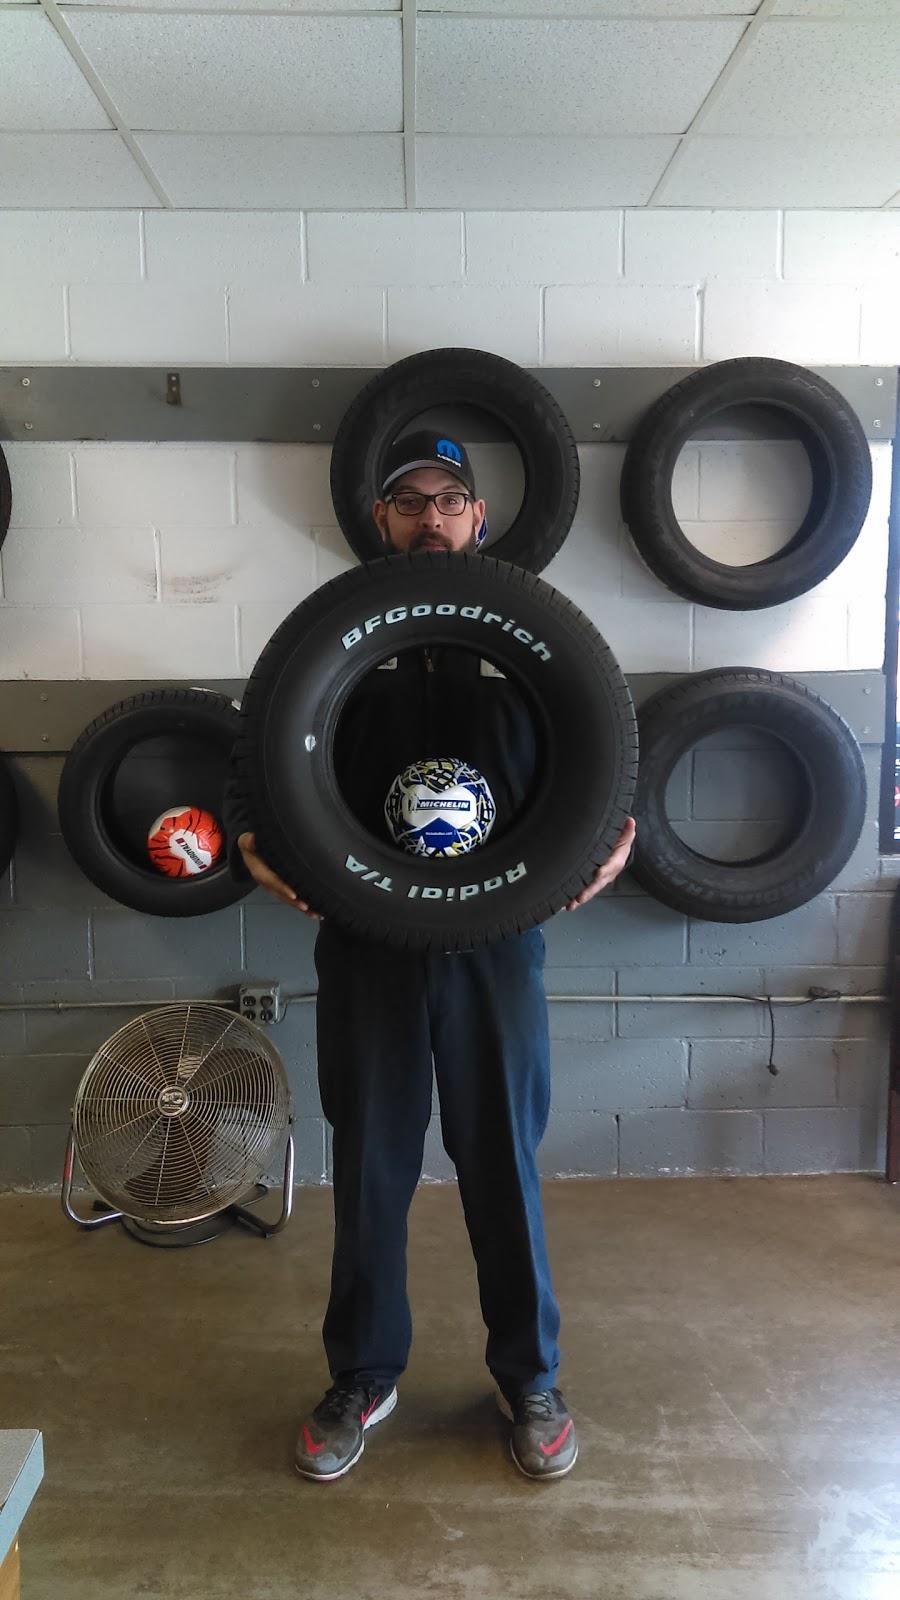 Harveys Tire & Services - car repair    Photo 6 of 7   Address: 306 S Main St, Randleman, NC 27317, USA   Phone: (336) 498-3272